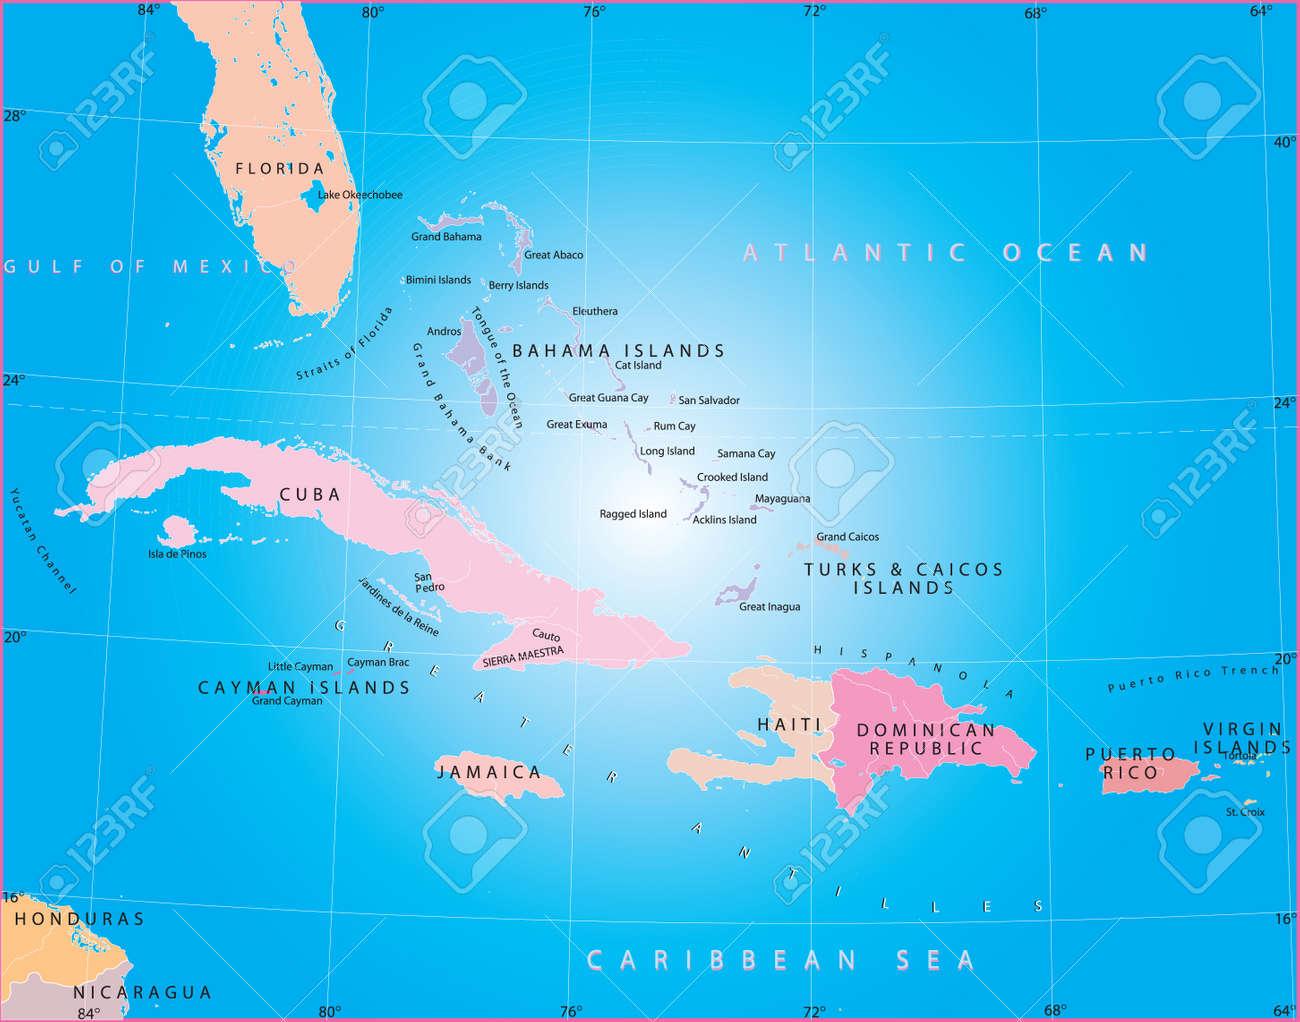 Caribbean sea. Stock Vector - 3062492